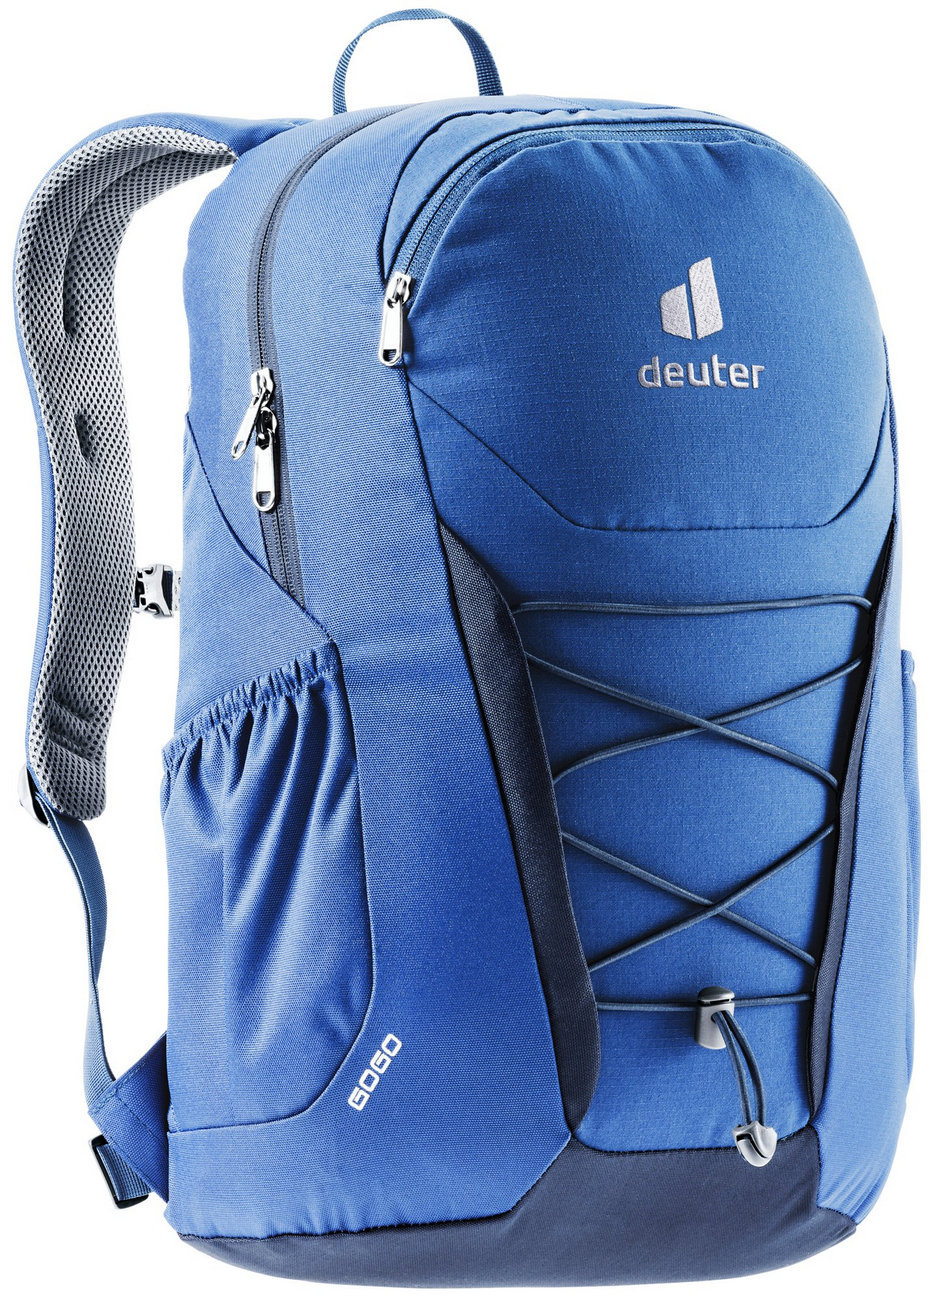 Городские рюкзаки Deuter Рюкзак Deuter Gogo 25 (2021) 3813221-3130-Gogo-w20-d0.jpg